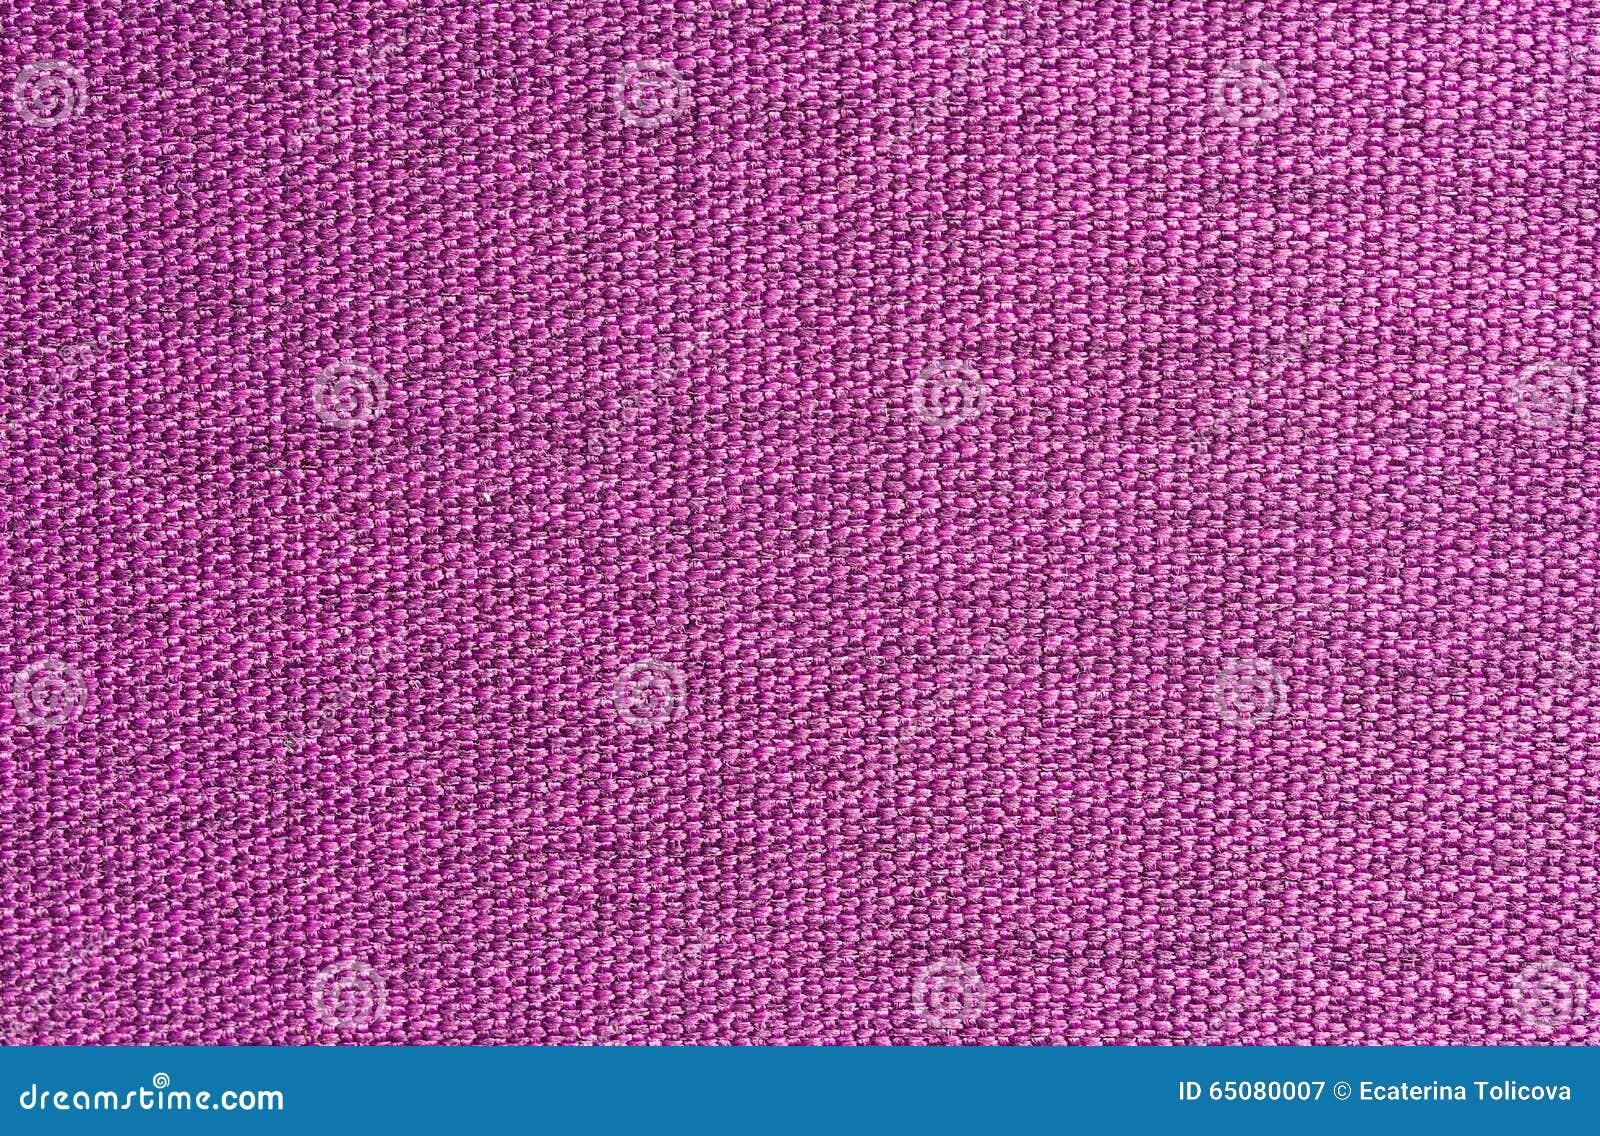 Violet fabric - background.